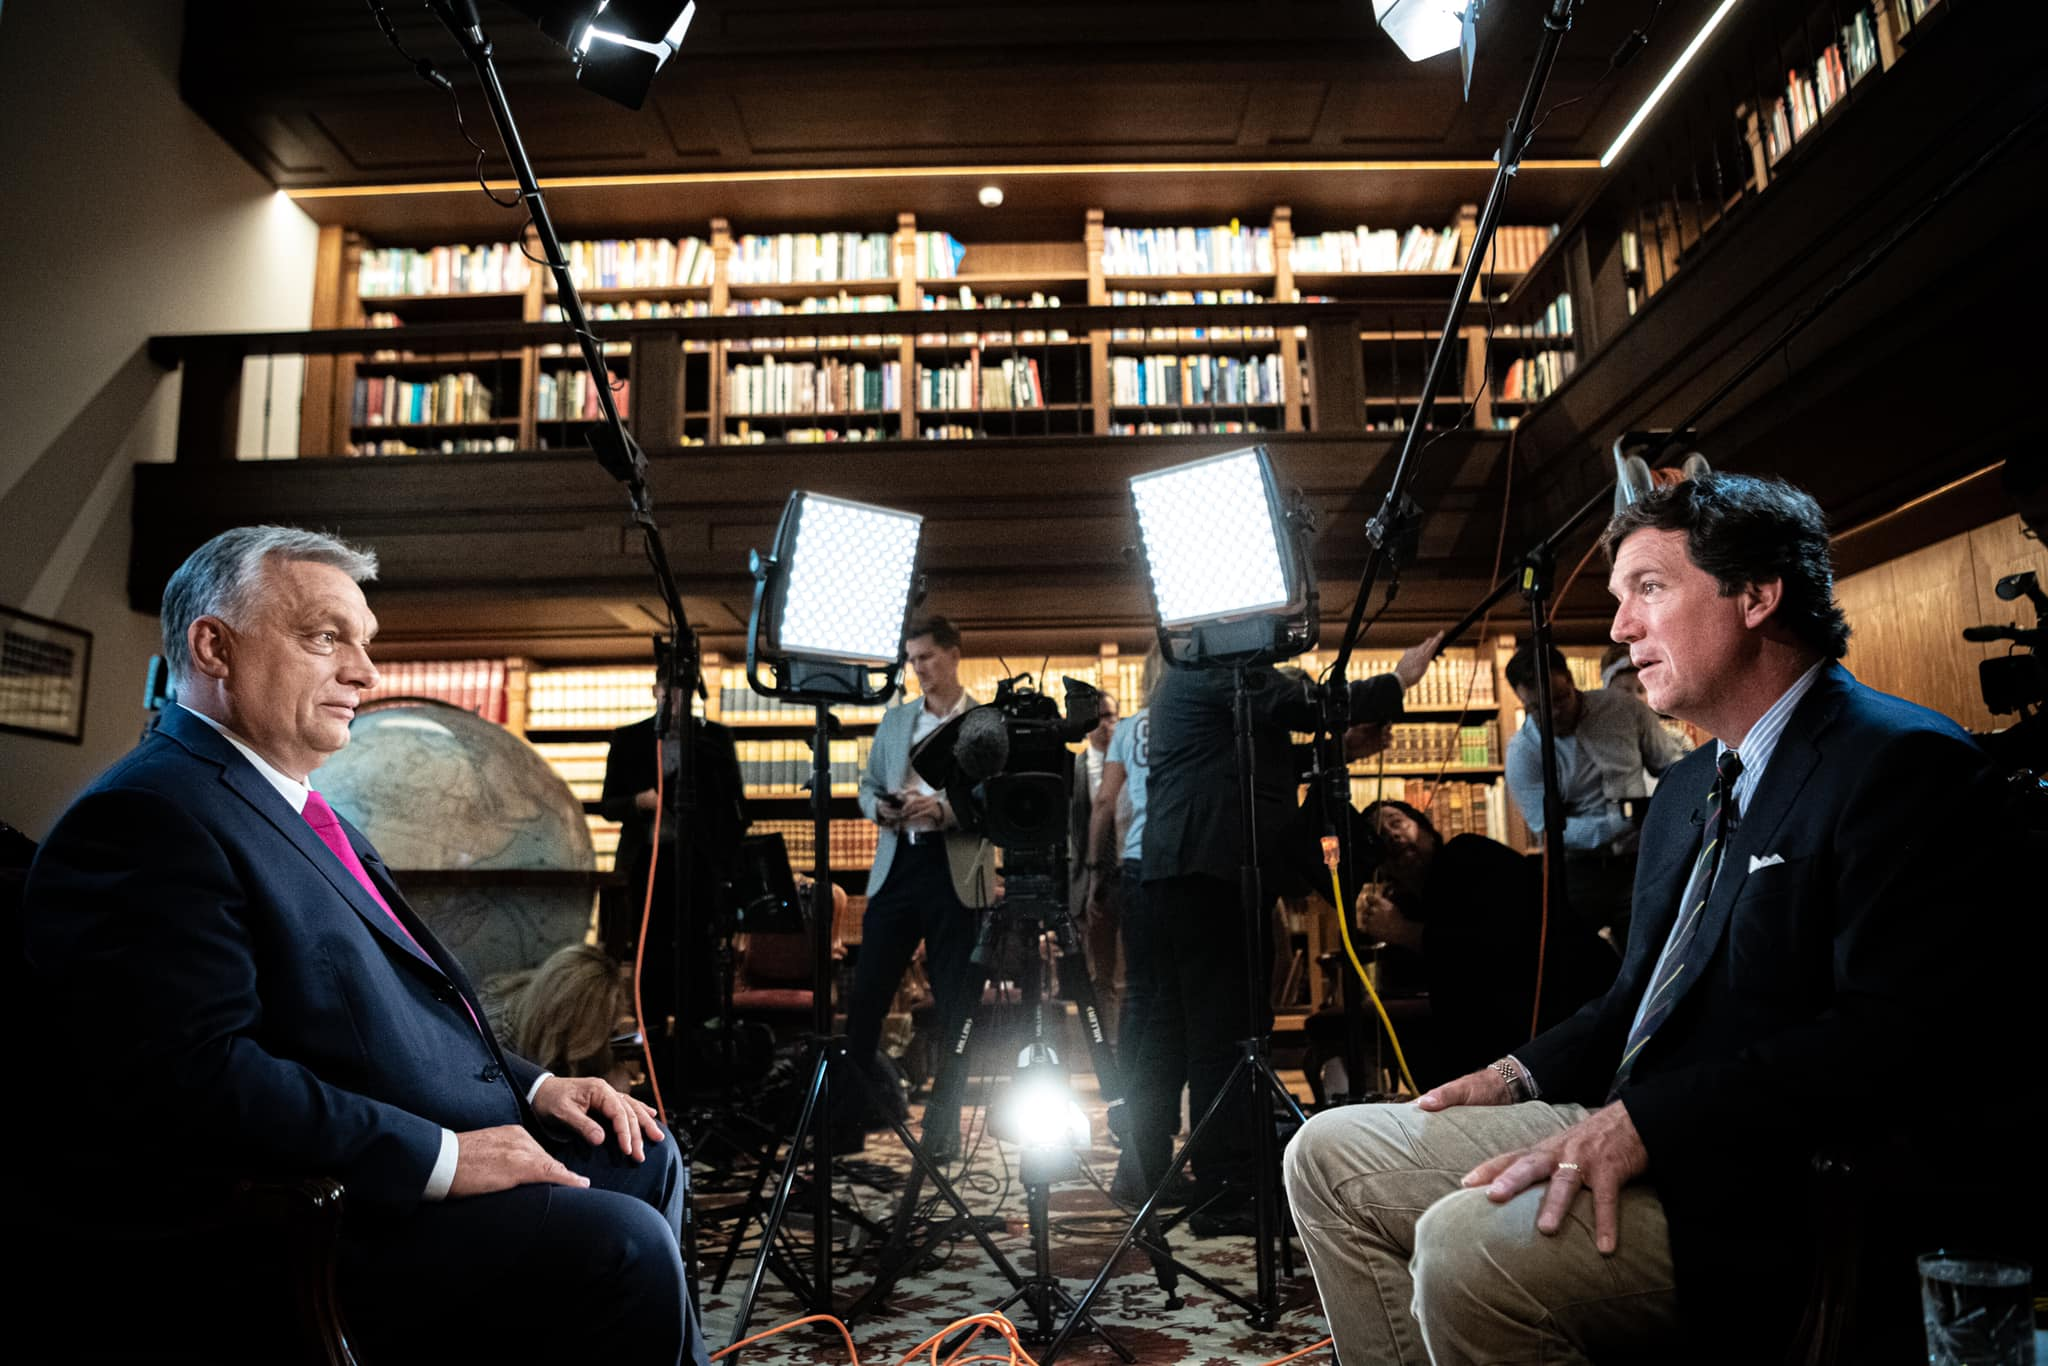 Hungary Fox News interview